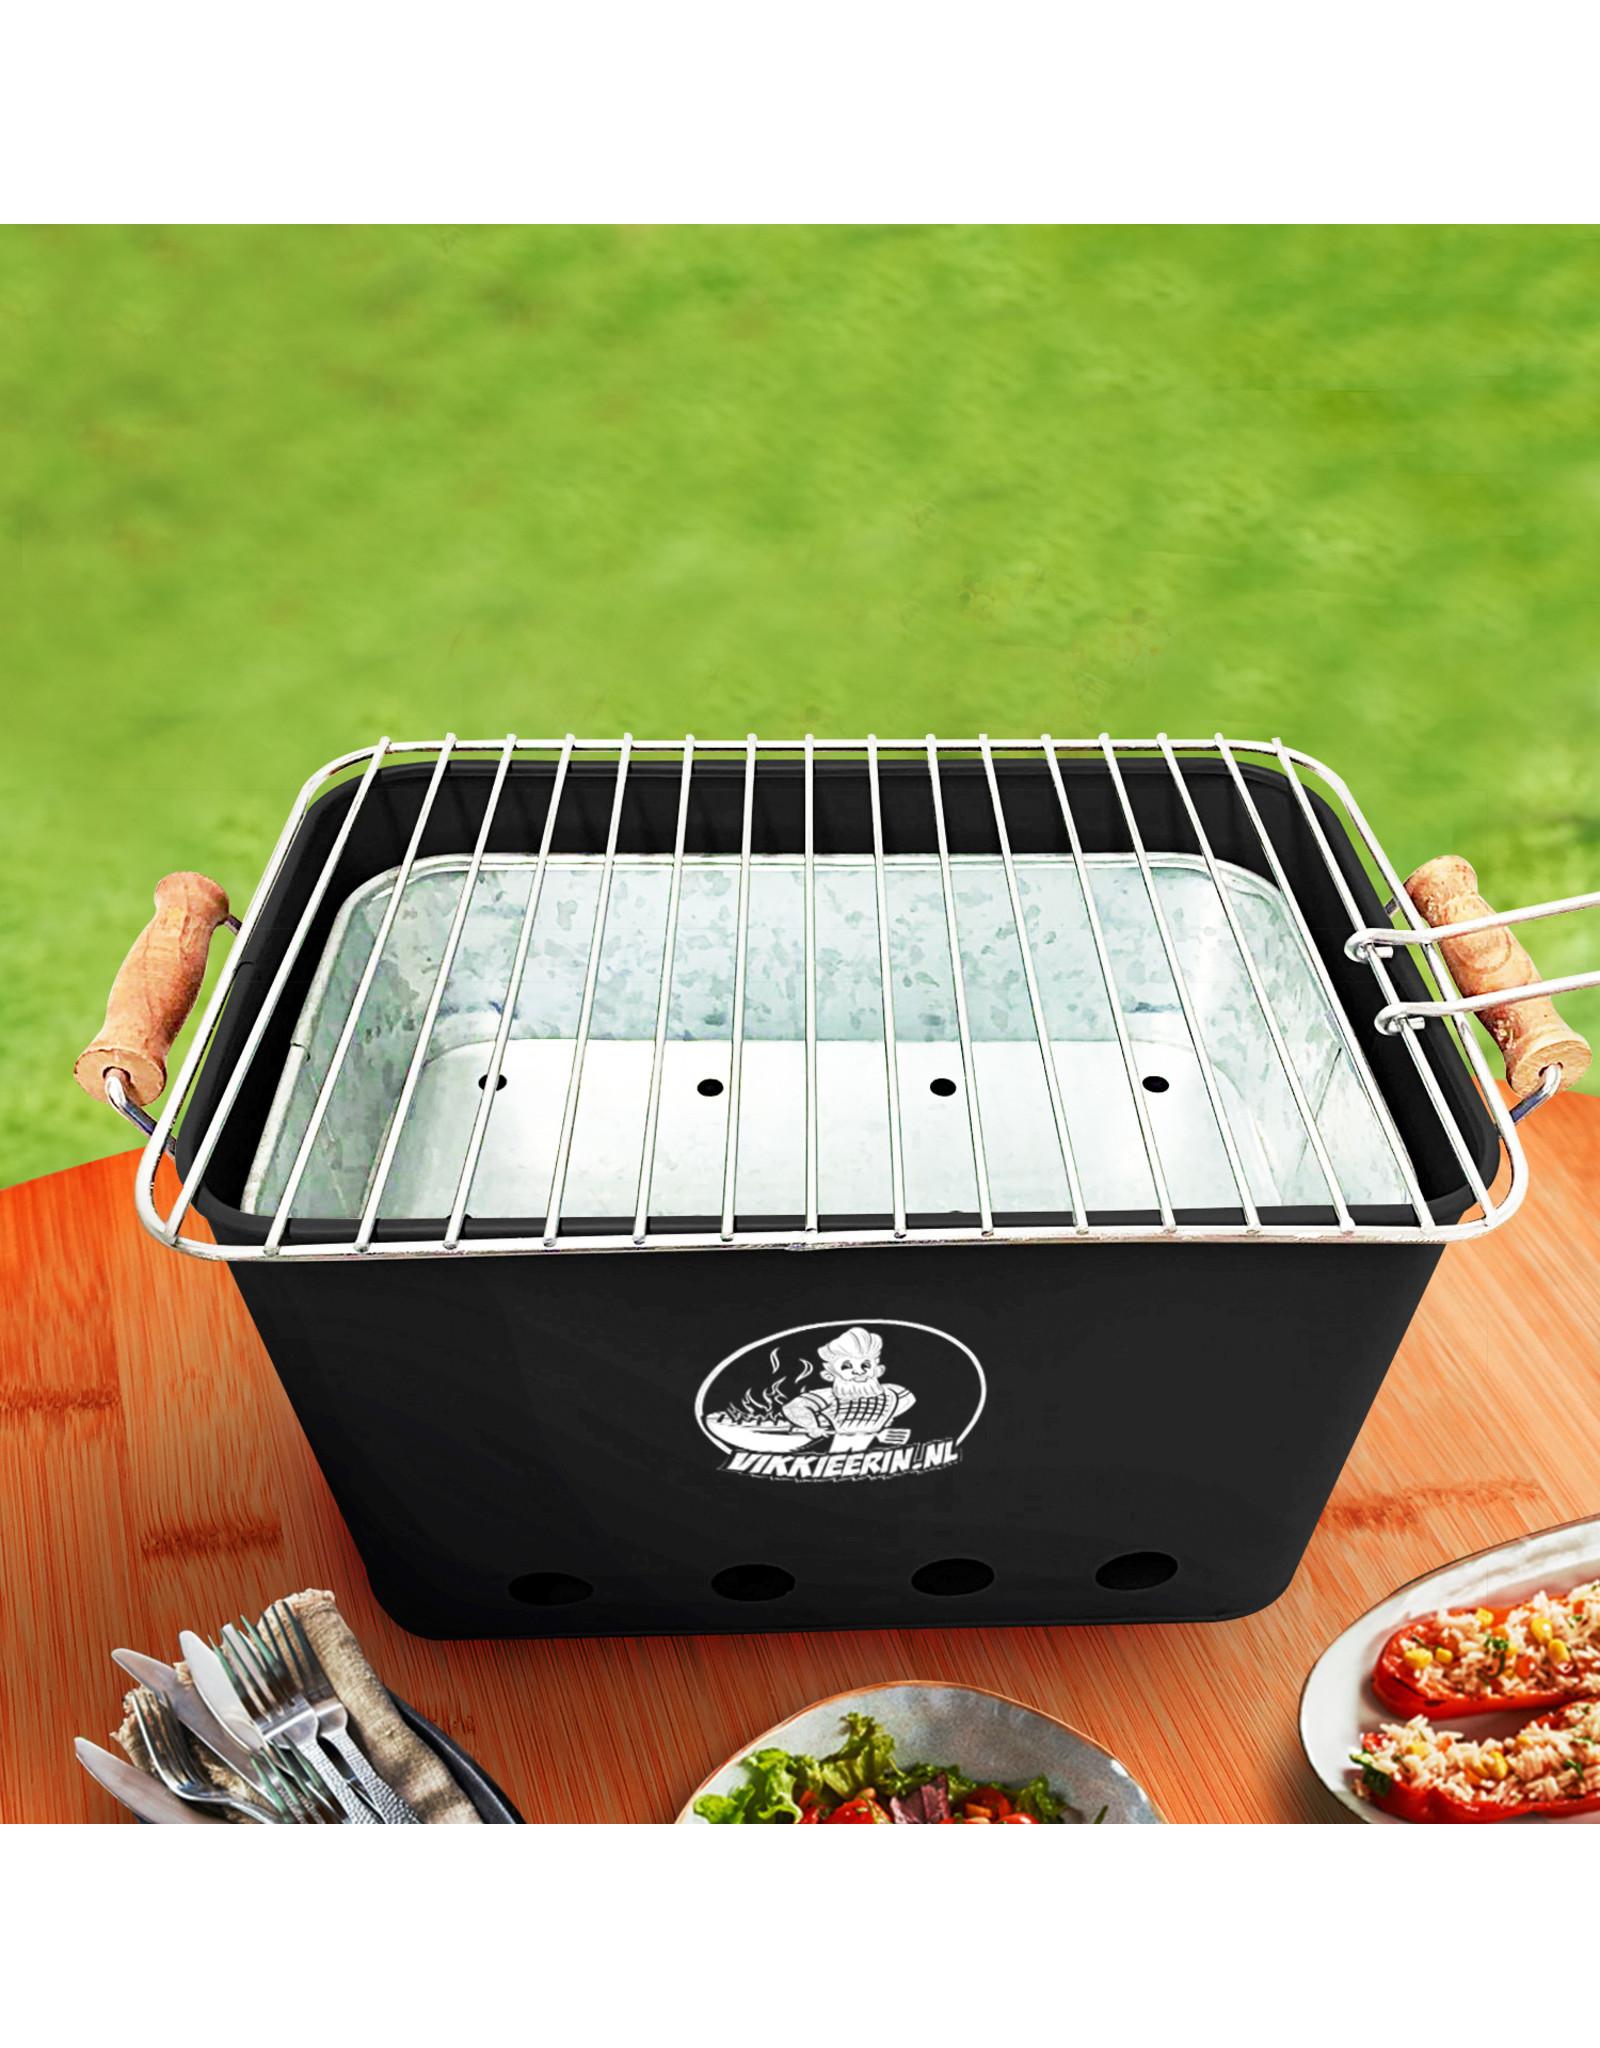 VIKKIEERIN.NL Vikkieerin.nl - Medium Portable Charcoal BBQ - square - black